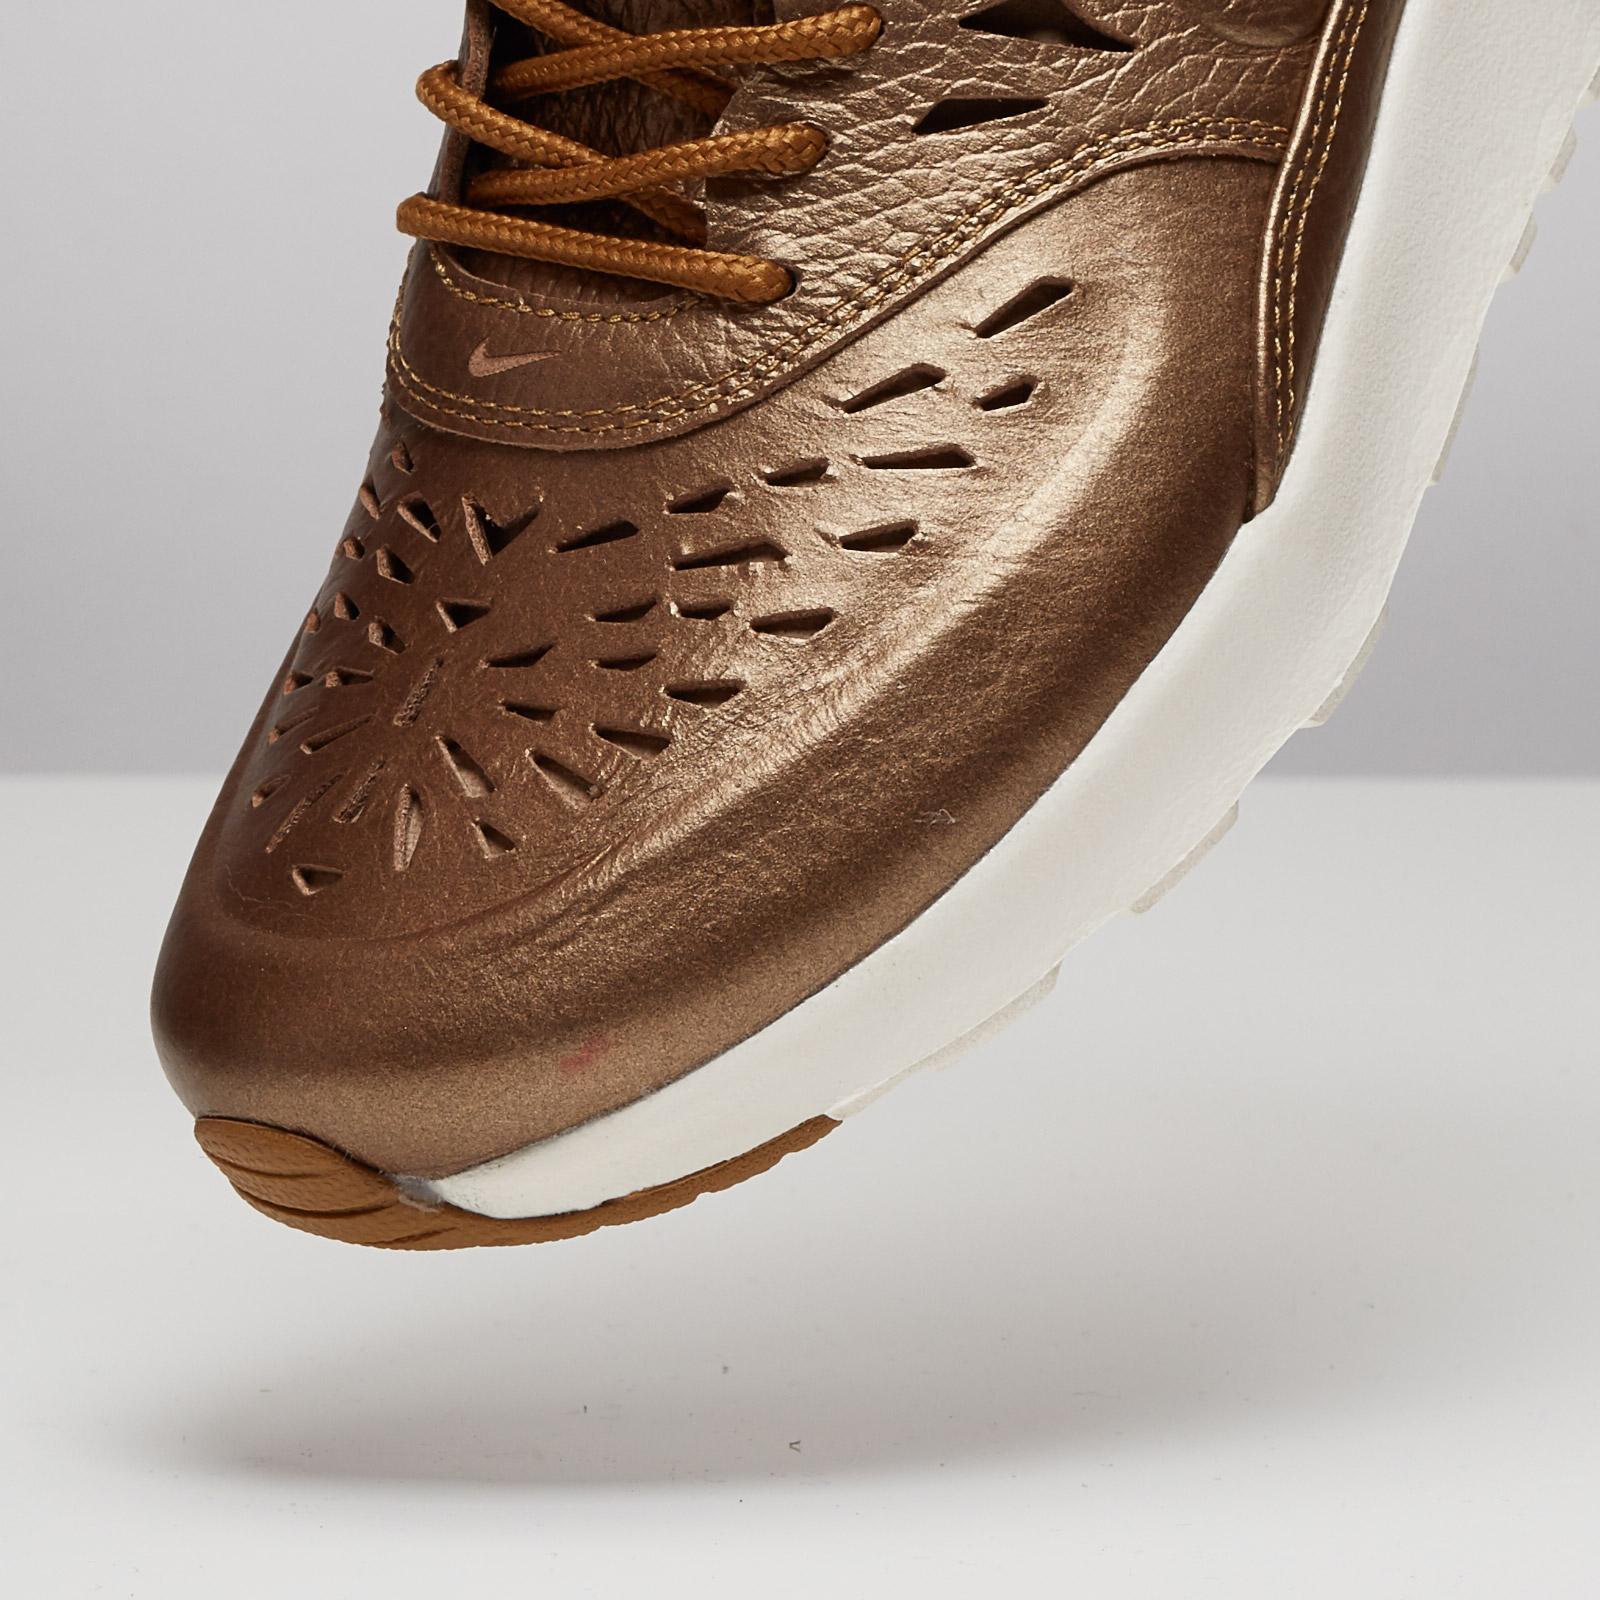 more photos d5ec8 d7262 Nike W Air Max Thea Joli - 725118-900 - Sneakersnstuff   sneakers    streetwear online since 1999